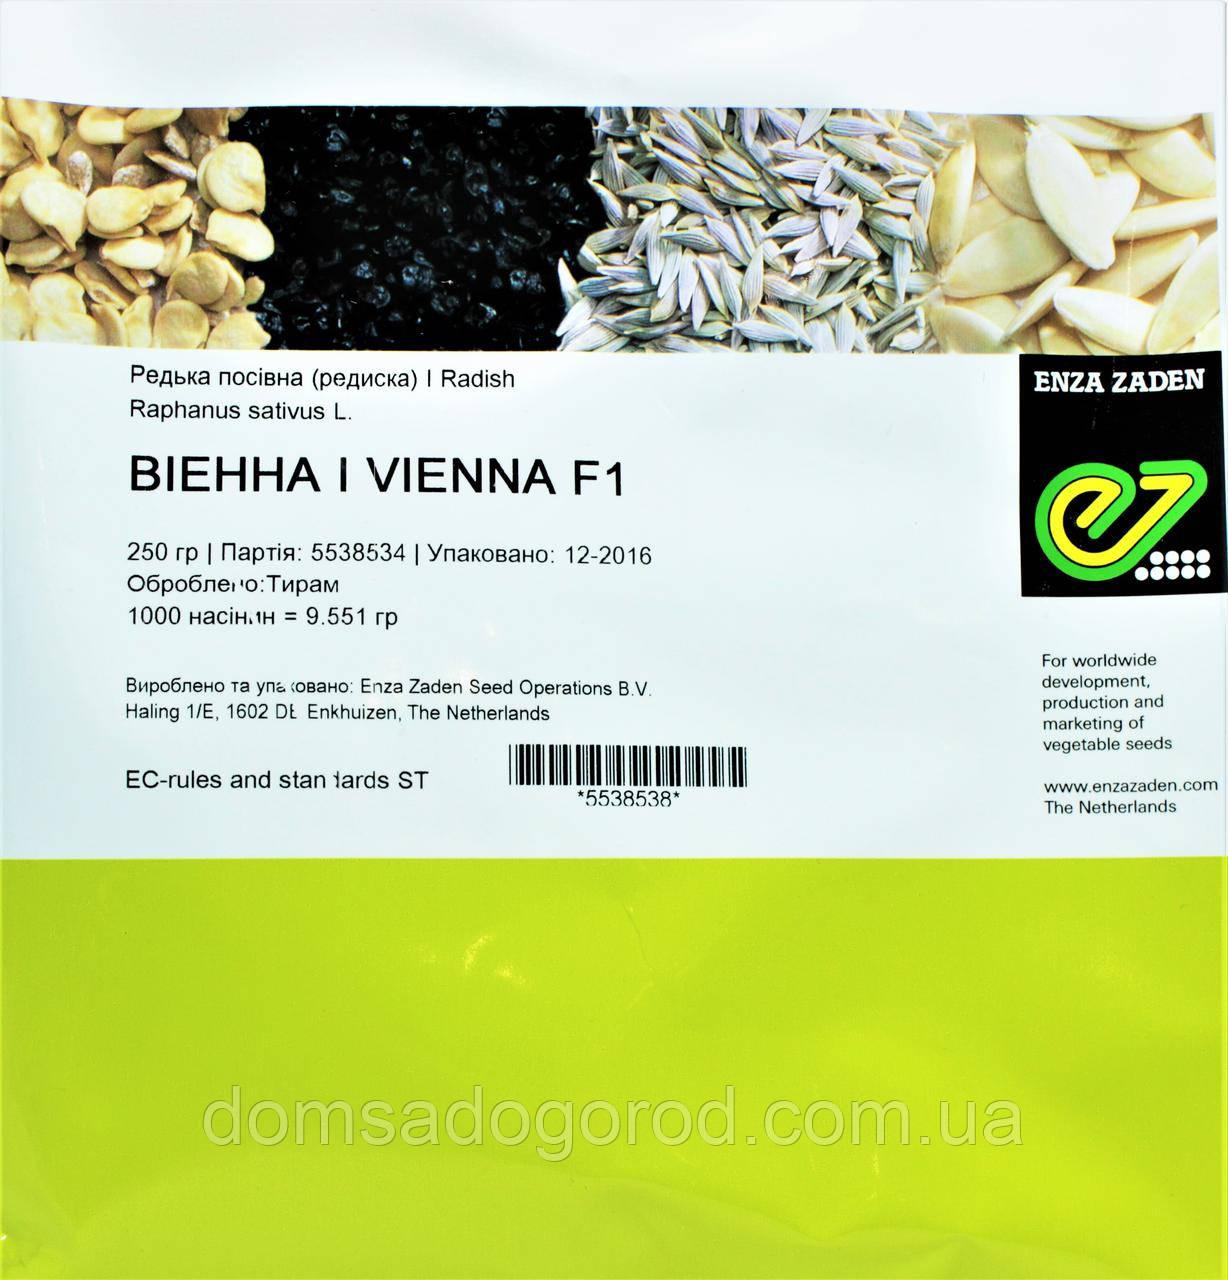 Редис ВИЕННА F1/ VIENNA F1 Enza Zaden 250 г